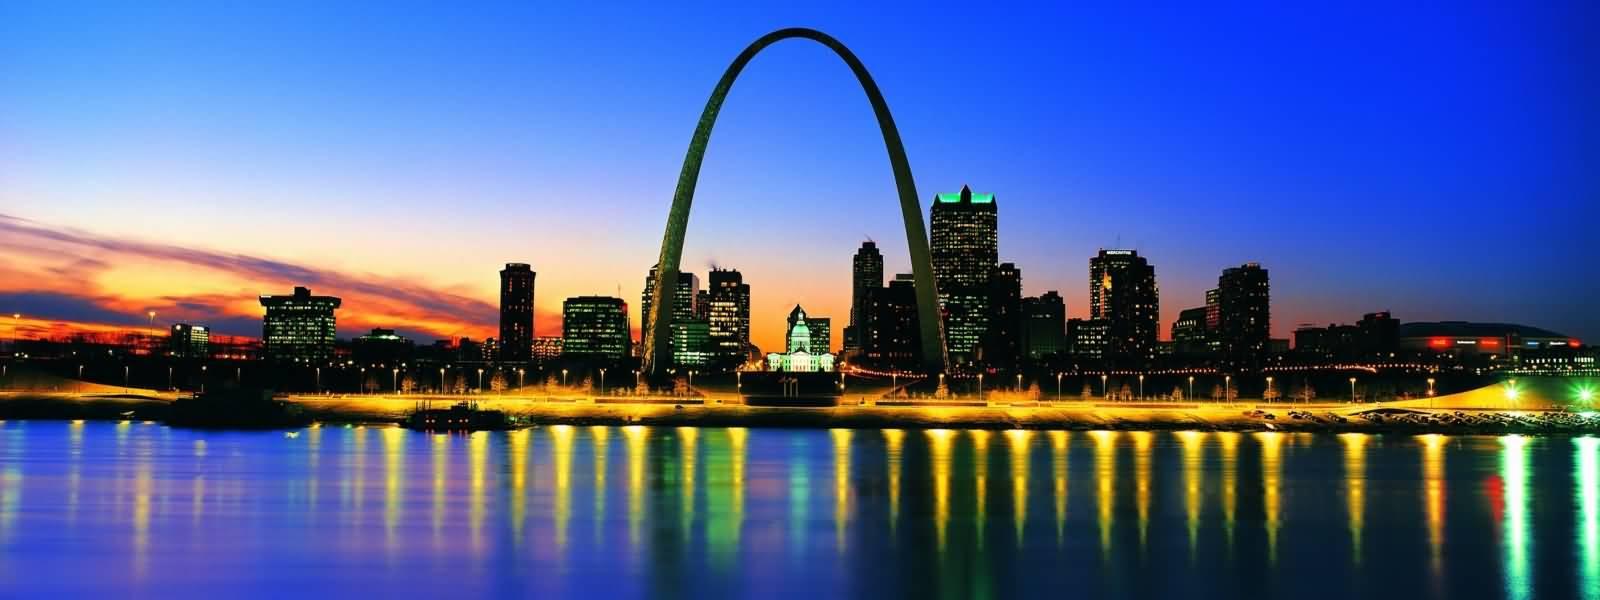 Riverboat Gambling St Louis Mo